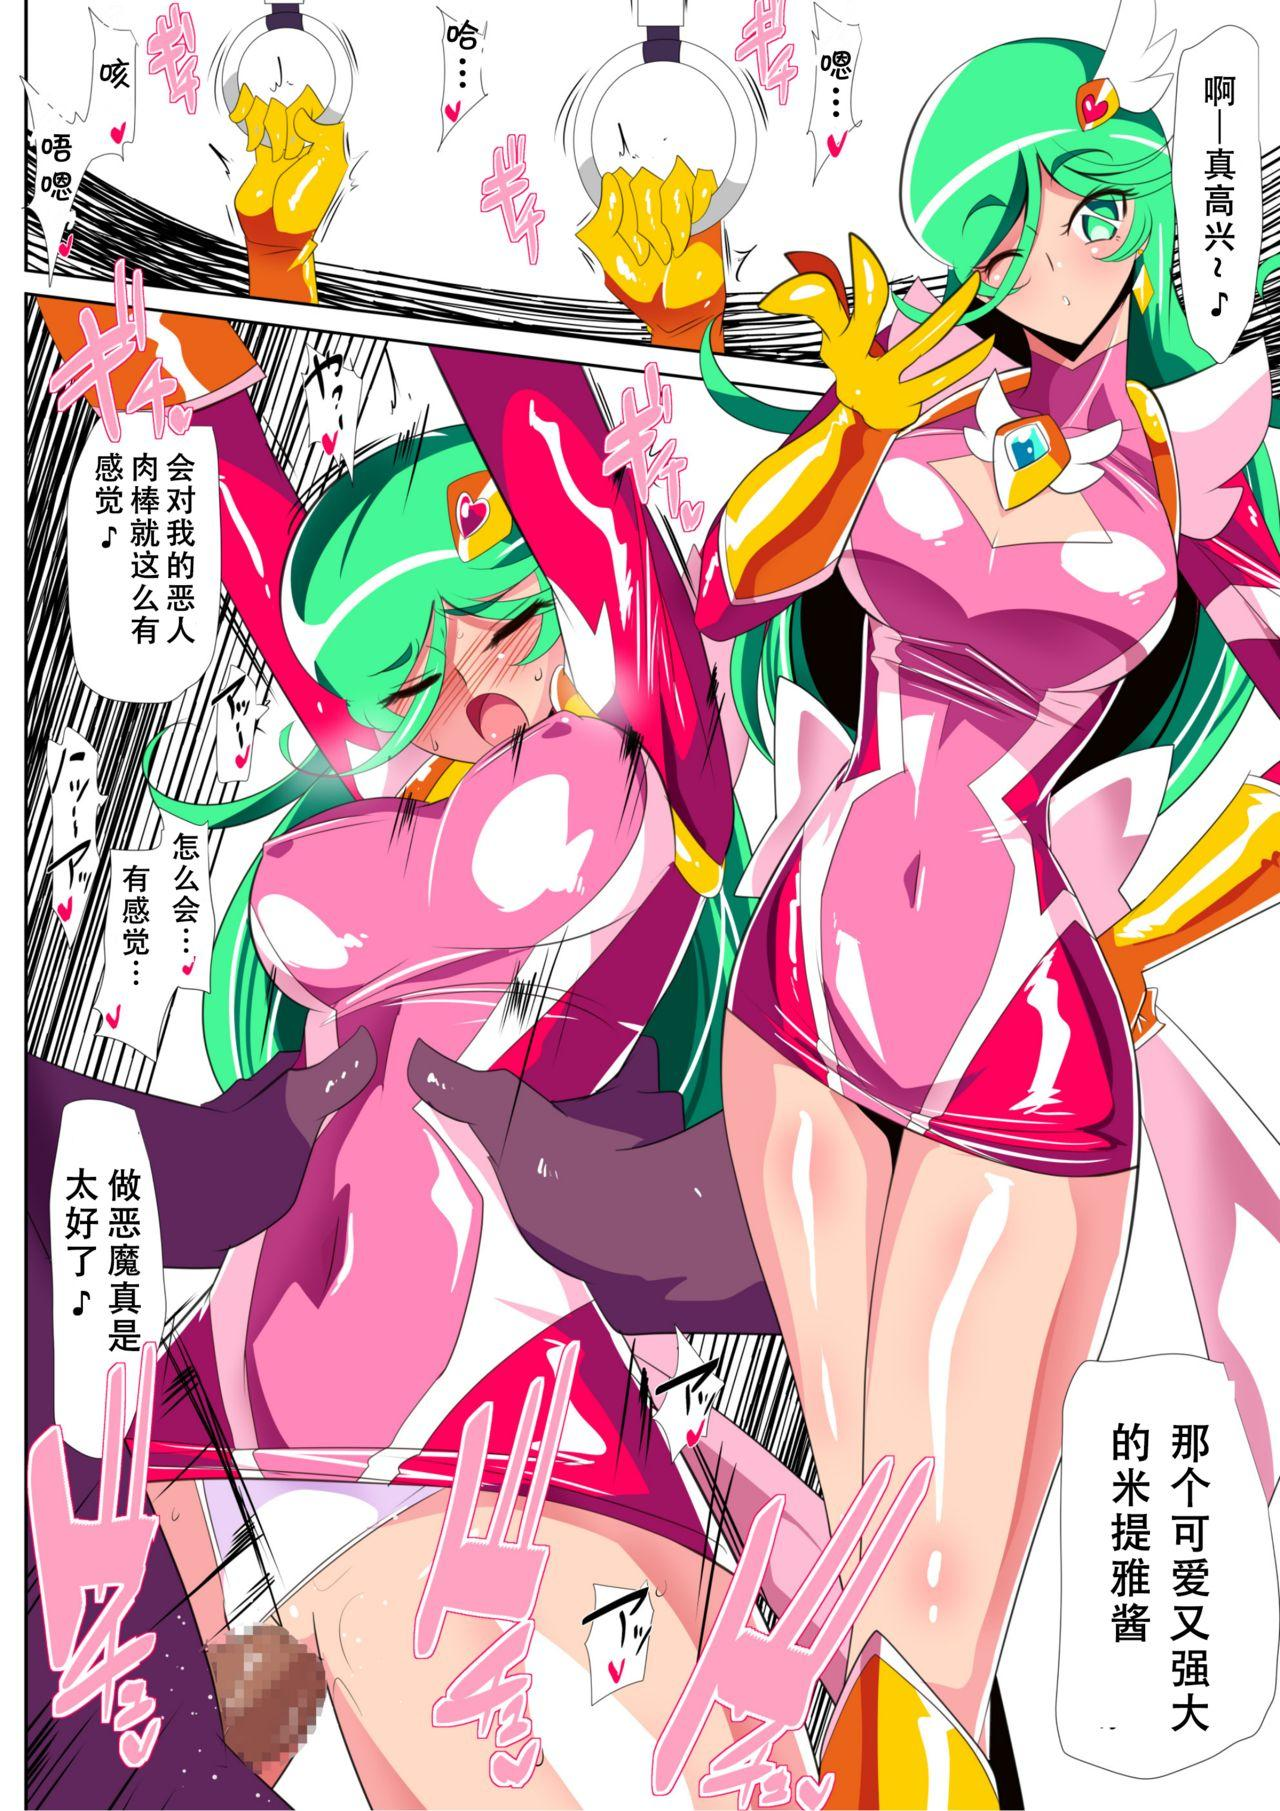 HEROINE LOSE 2 Psycho Lady Meteor Hen Psycho Power Heroine VS Kyousei Chikan Choukyou! 20